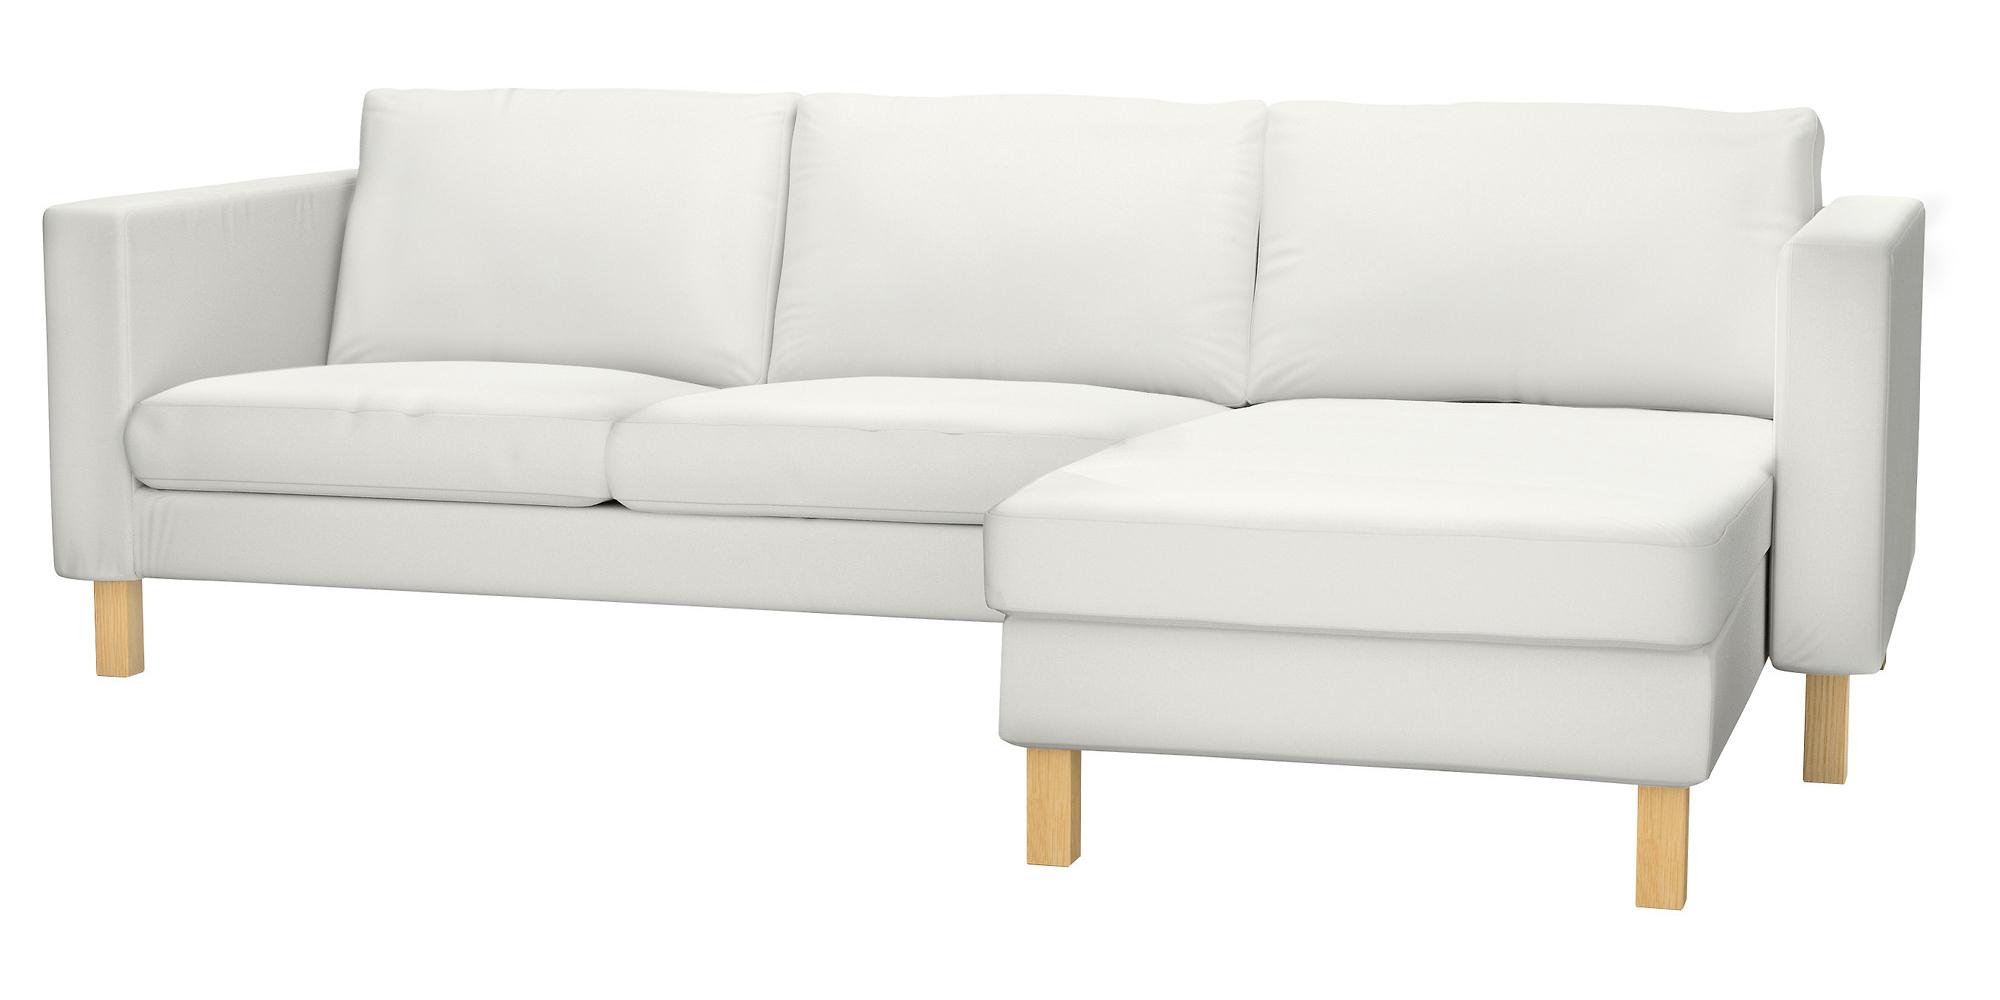 KARLSTAD Sofa from Ikea